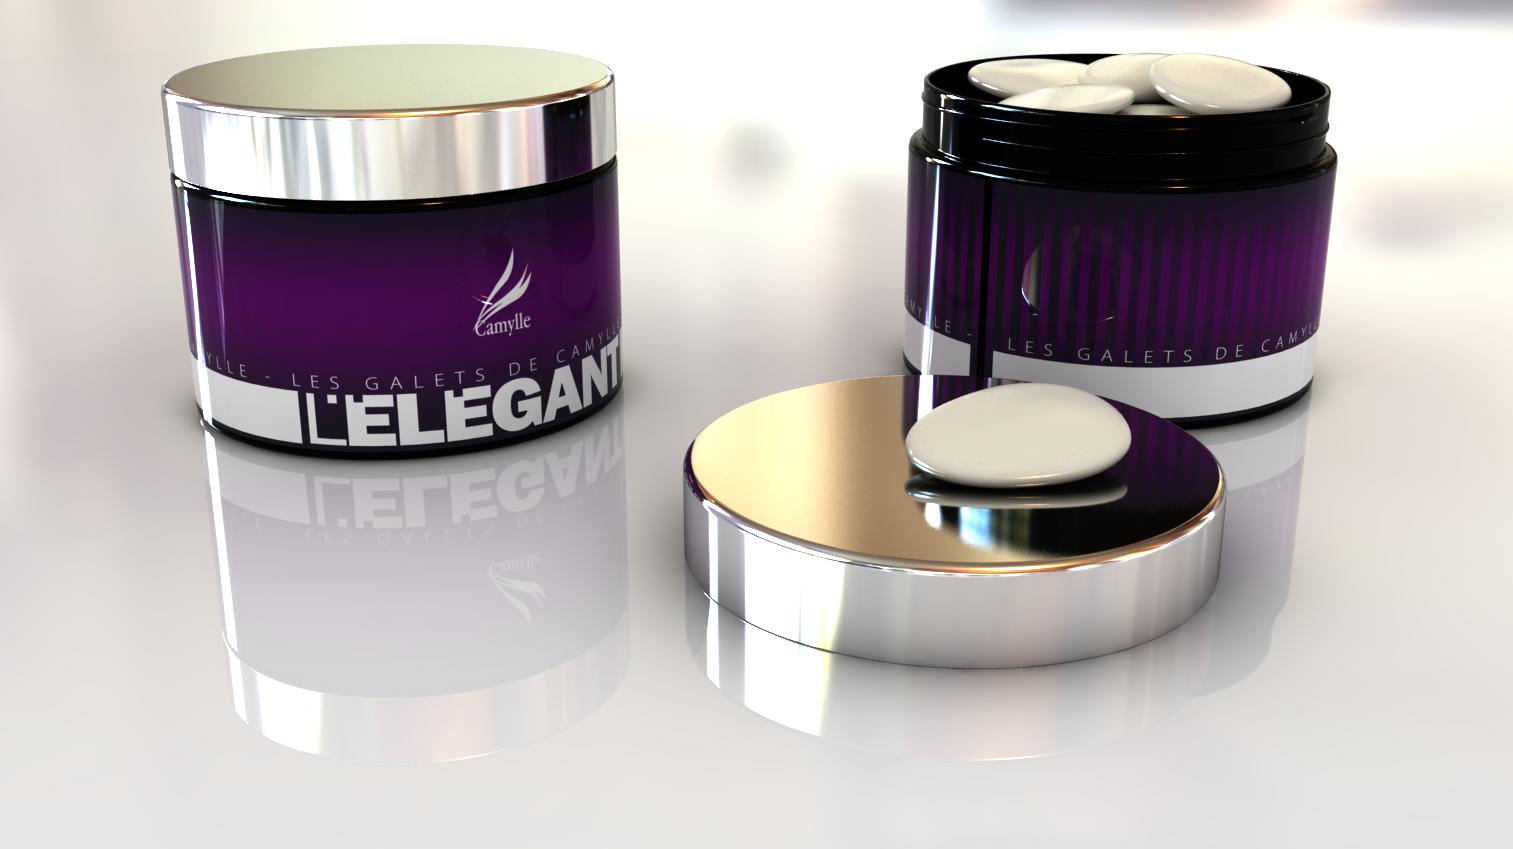 les galets parfum Elegant